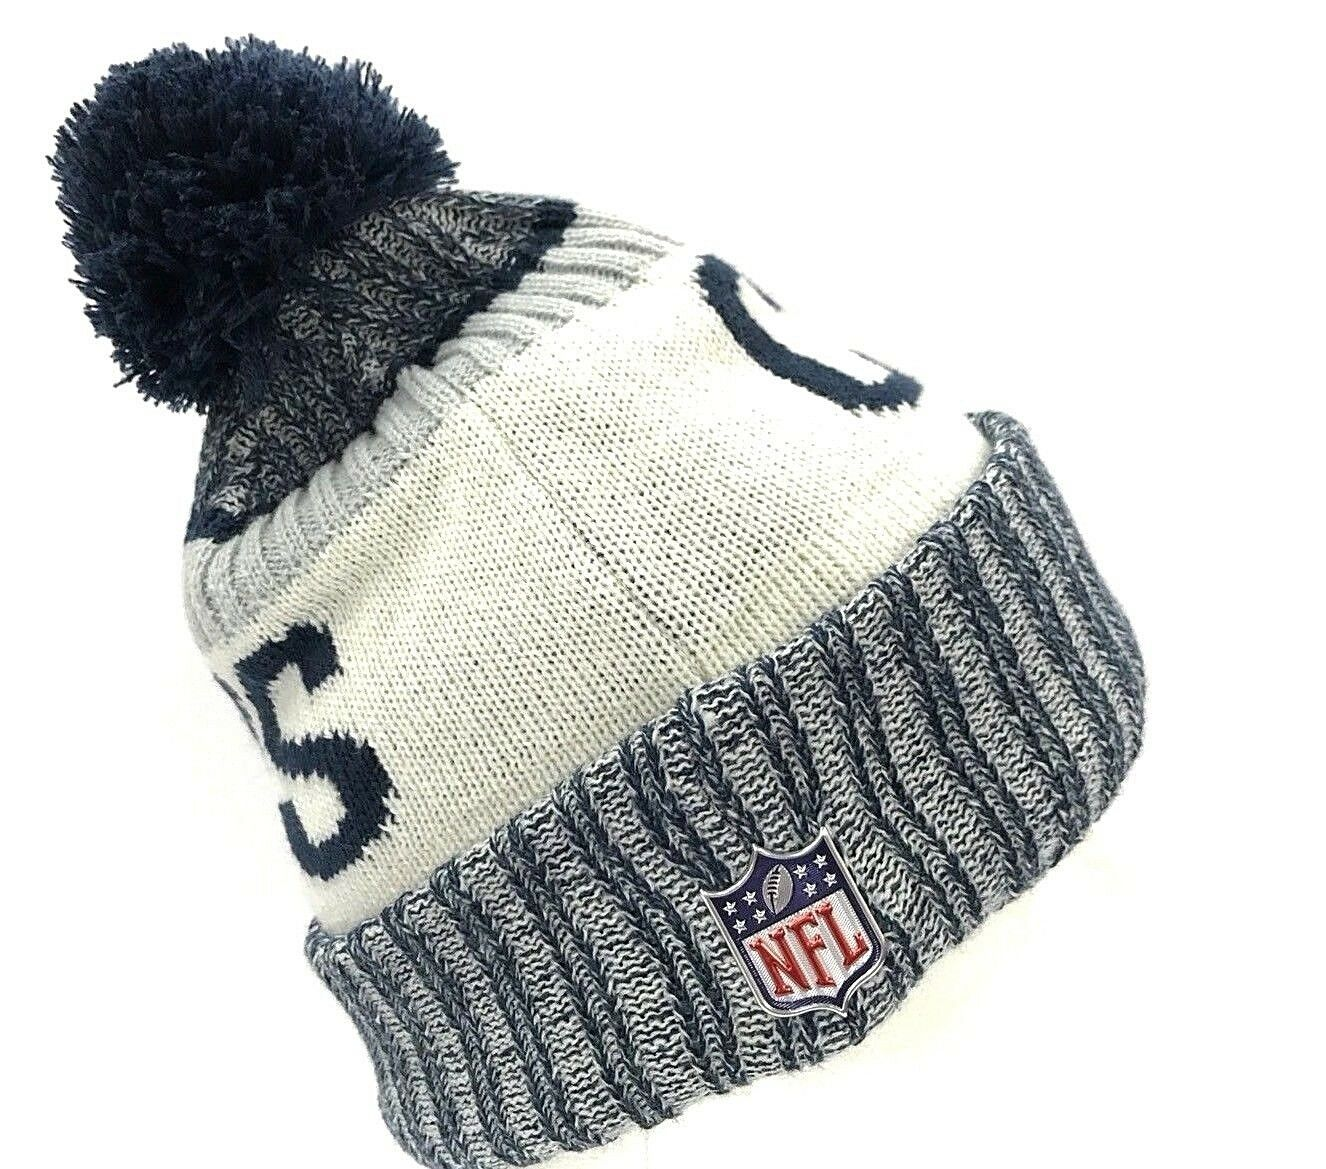 ca2601c03790f5 ... knit hat 08718 6ad0d; where can i buy 2017 18 dallas cowboys field new  era nfl on field cowboys sideline